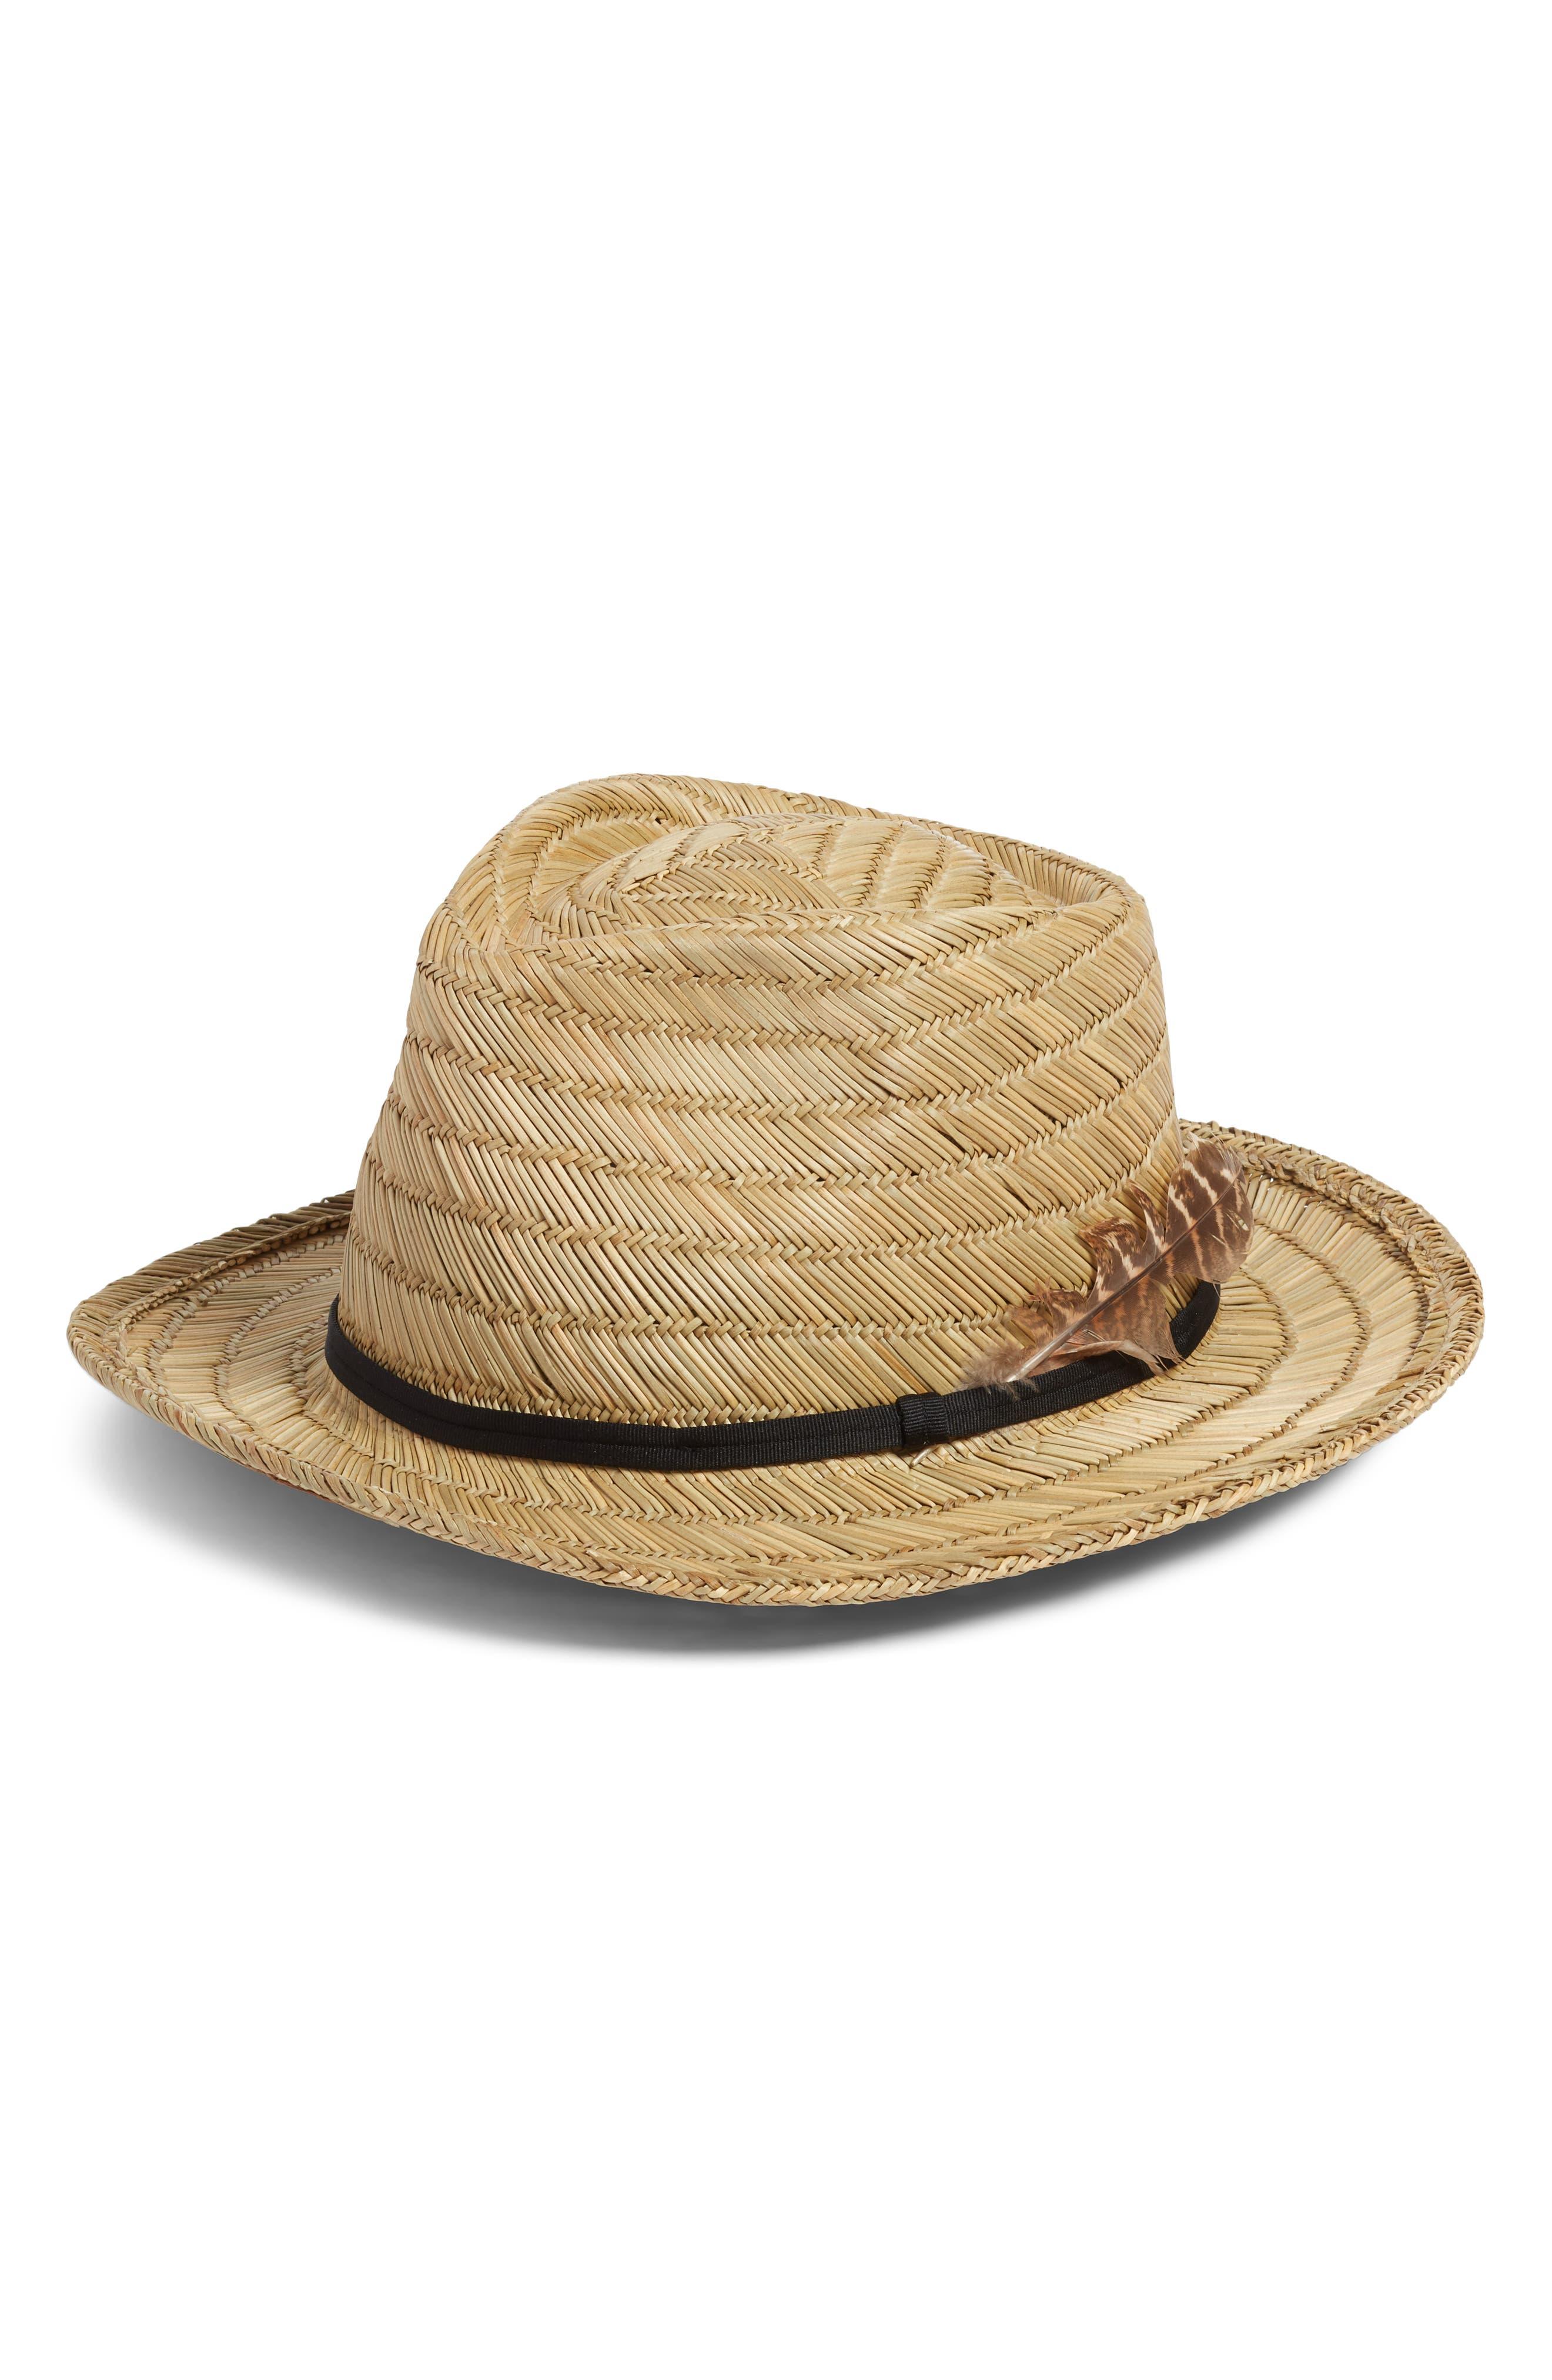 73dfaea50fa Brixton Fedora Hats for Men